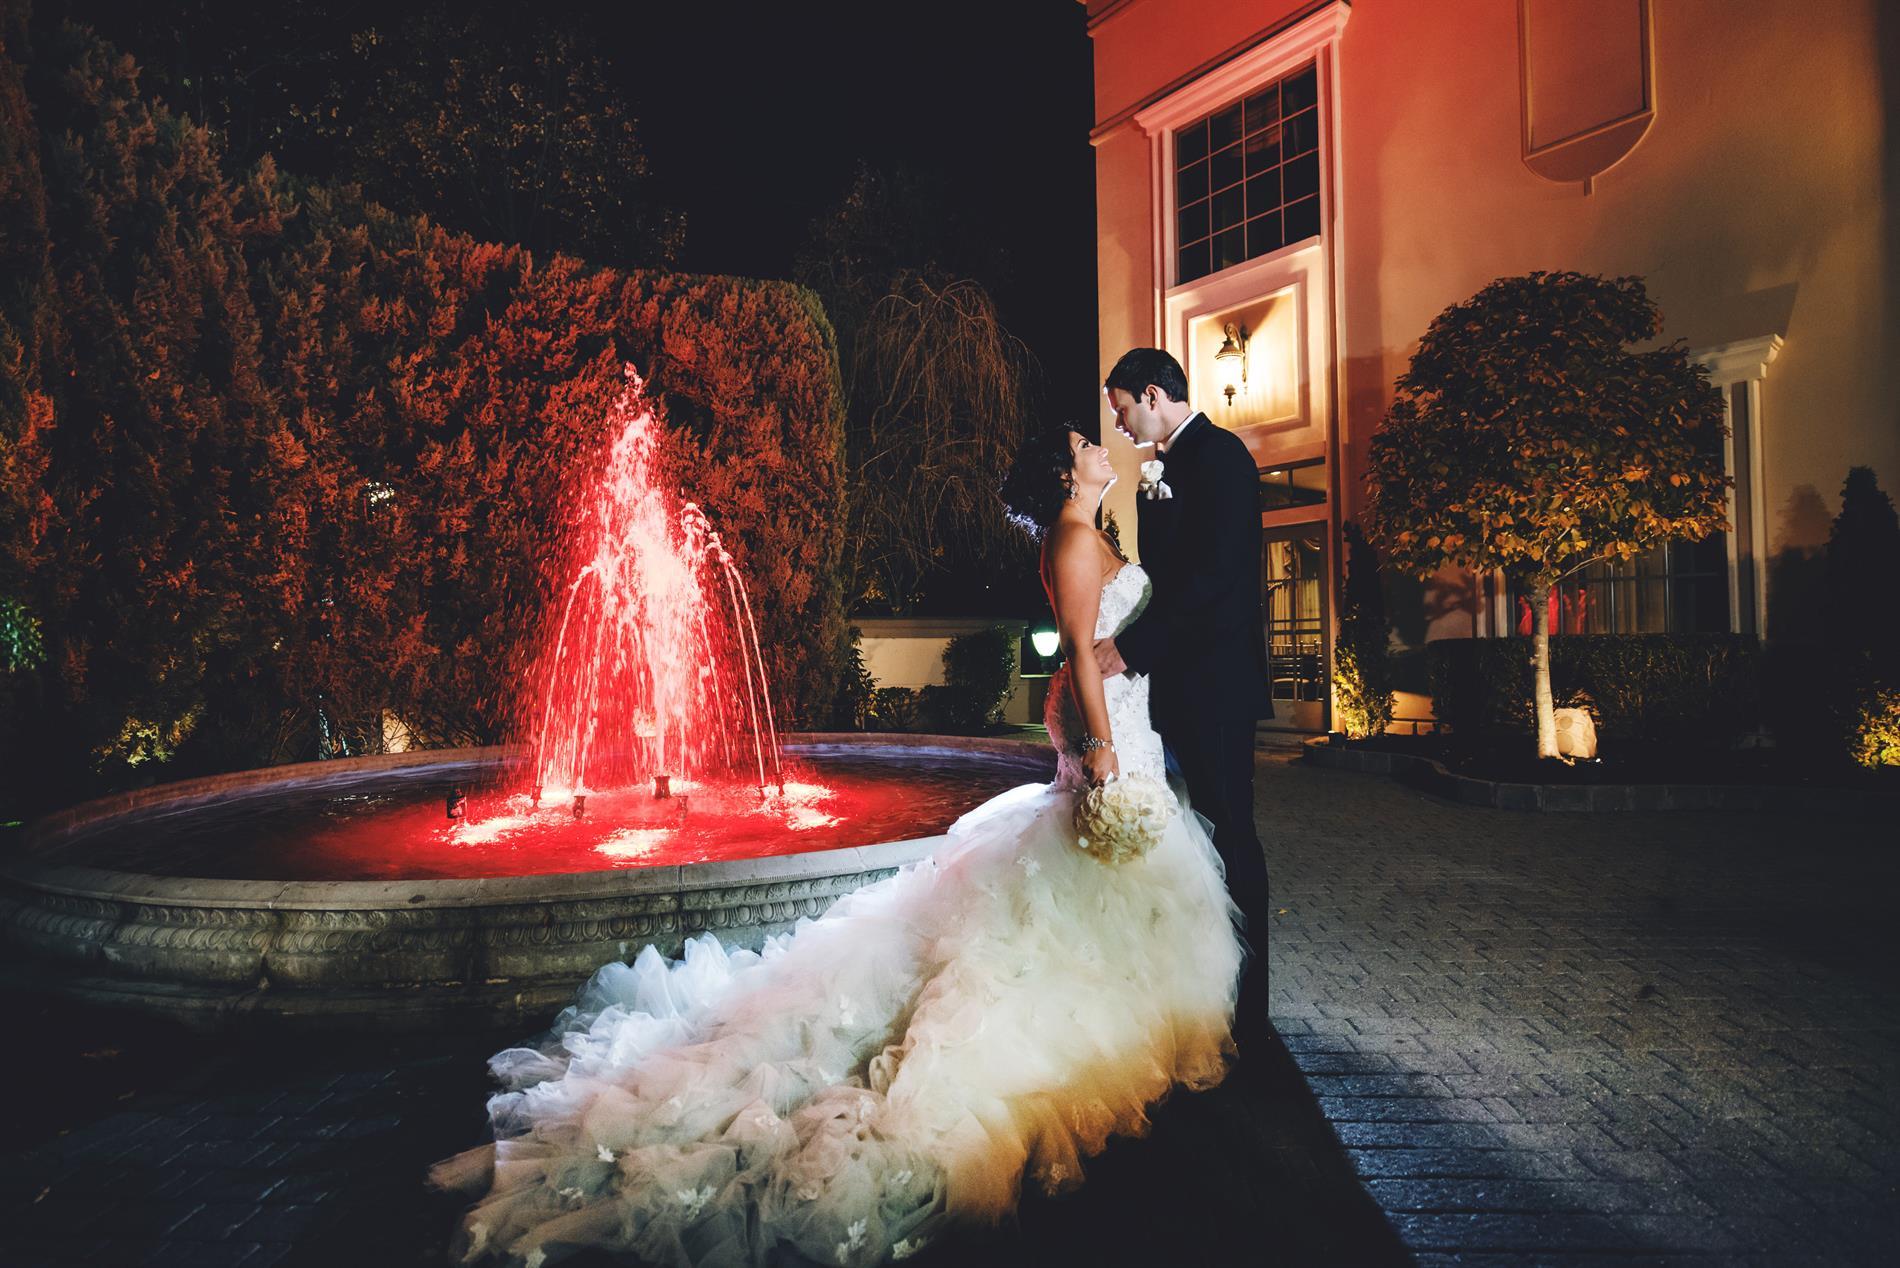 Dimitri & Terri Wedding Photos